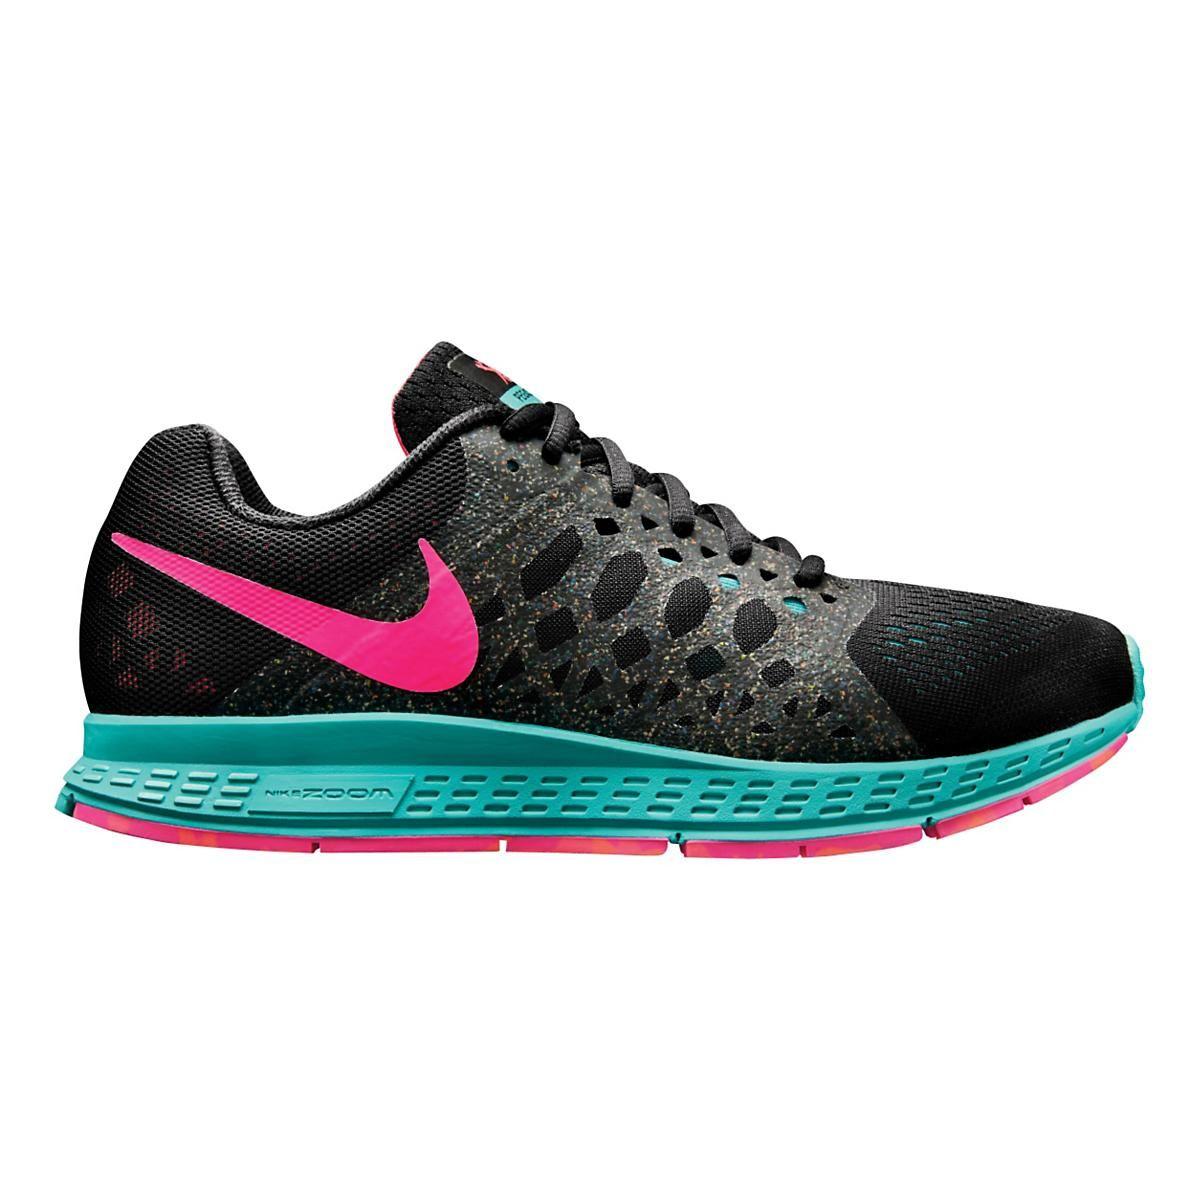 c1d47e1e15ea ... clearance womens nike air zoom pegasus 31 running shoe at road runner  sports eaee4 2d9ff